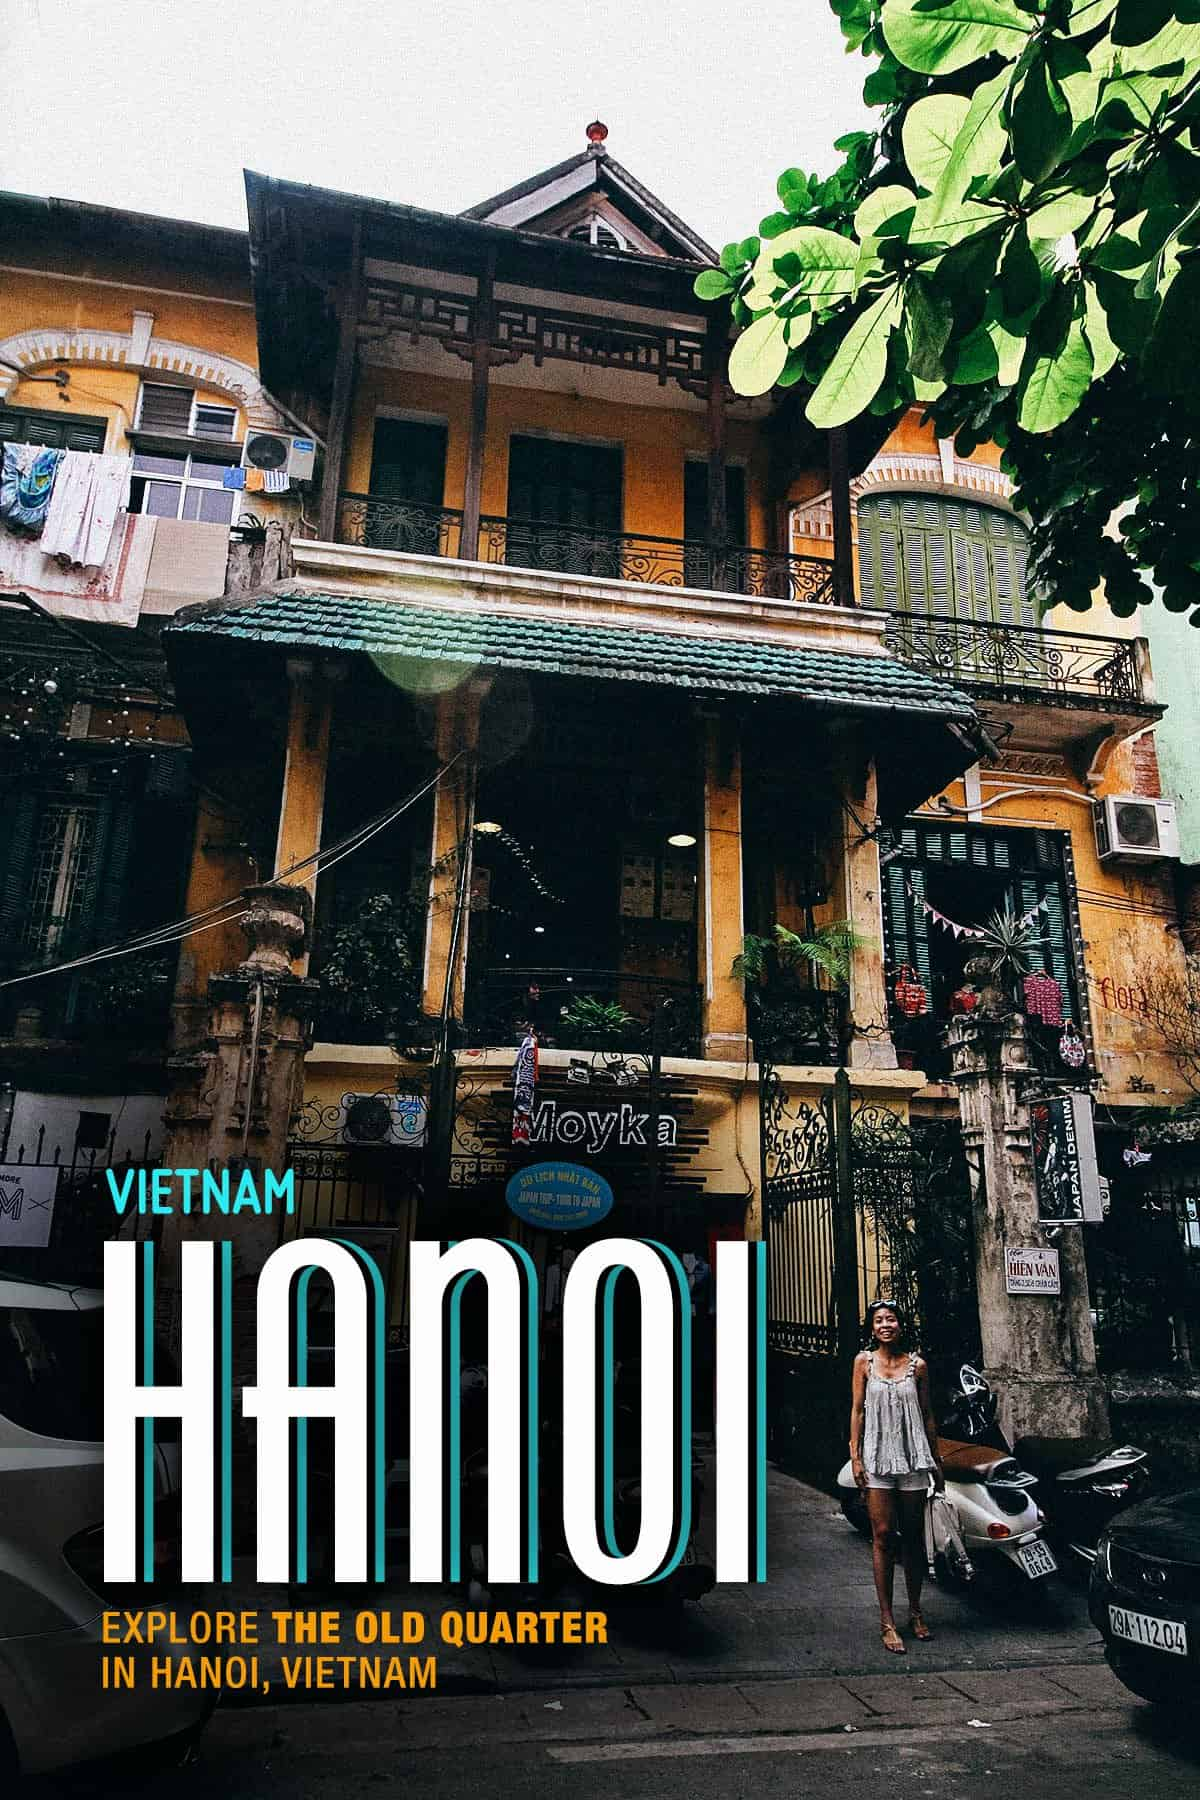 Old House in Hanoi, Vietnam